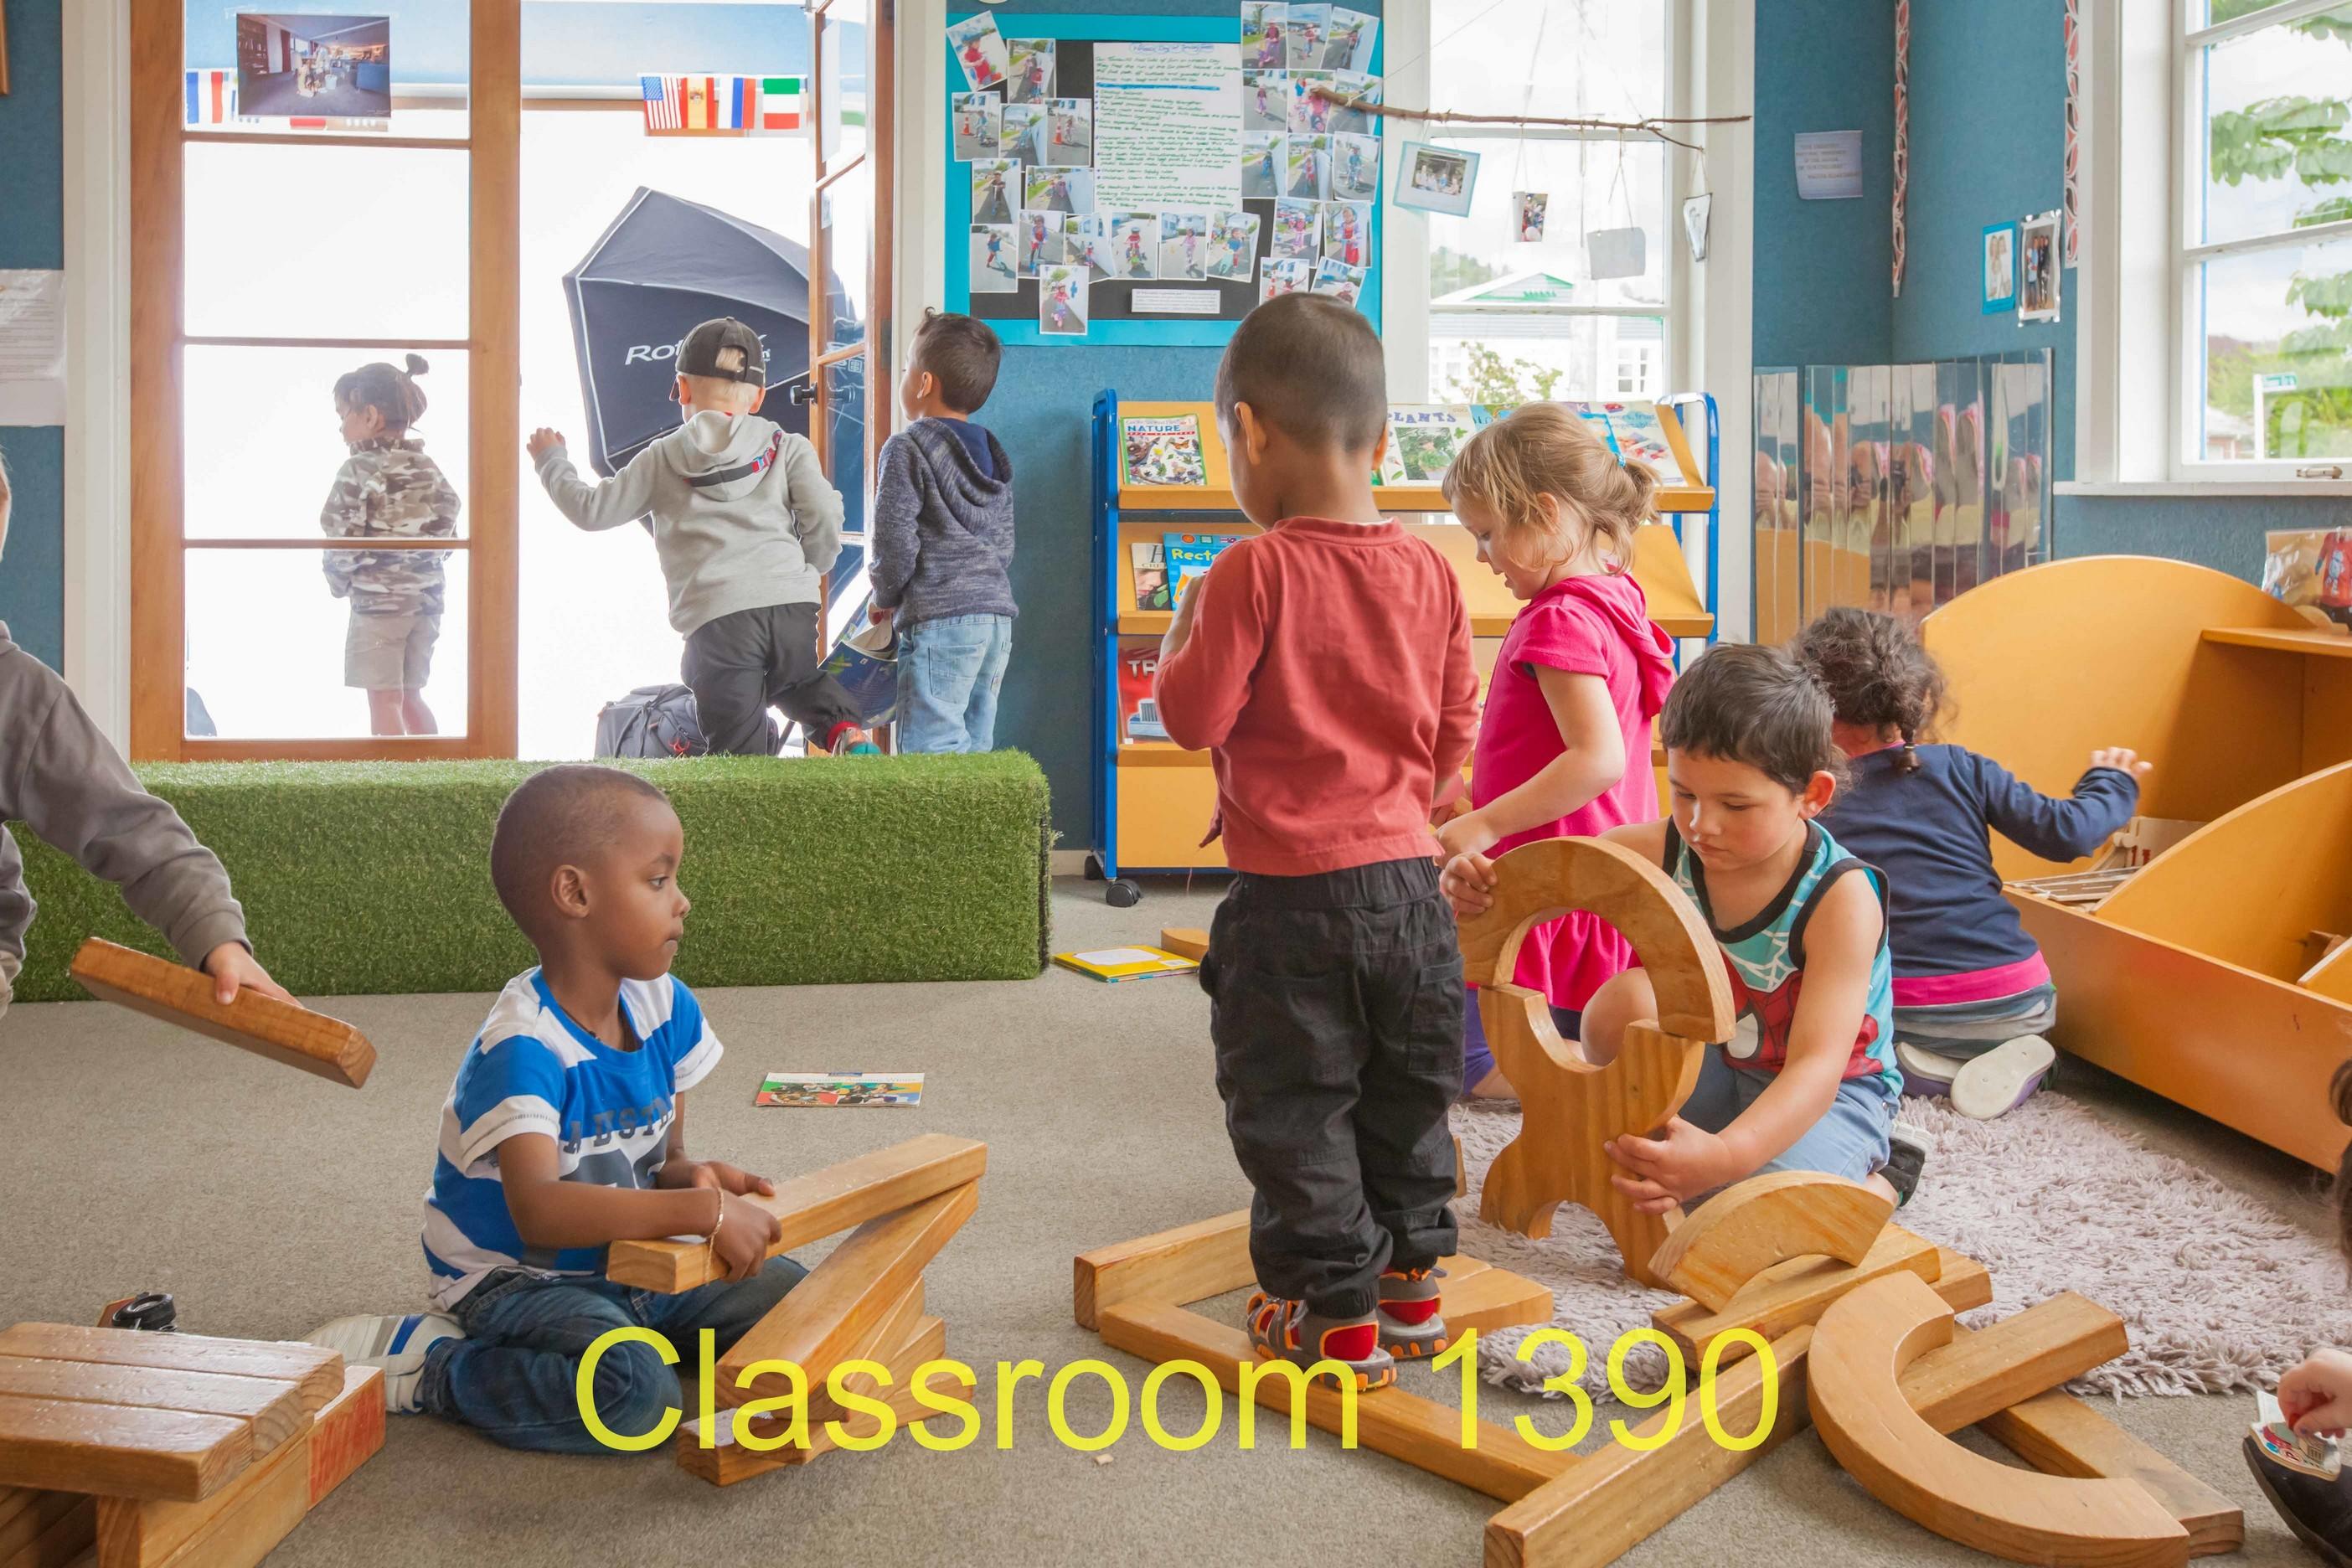 Classroom 1390